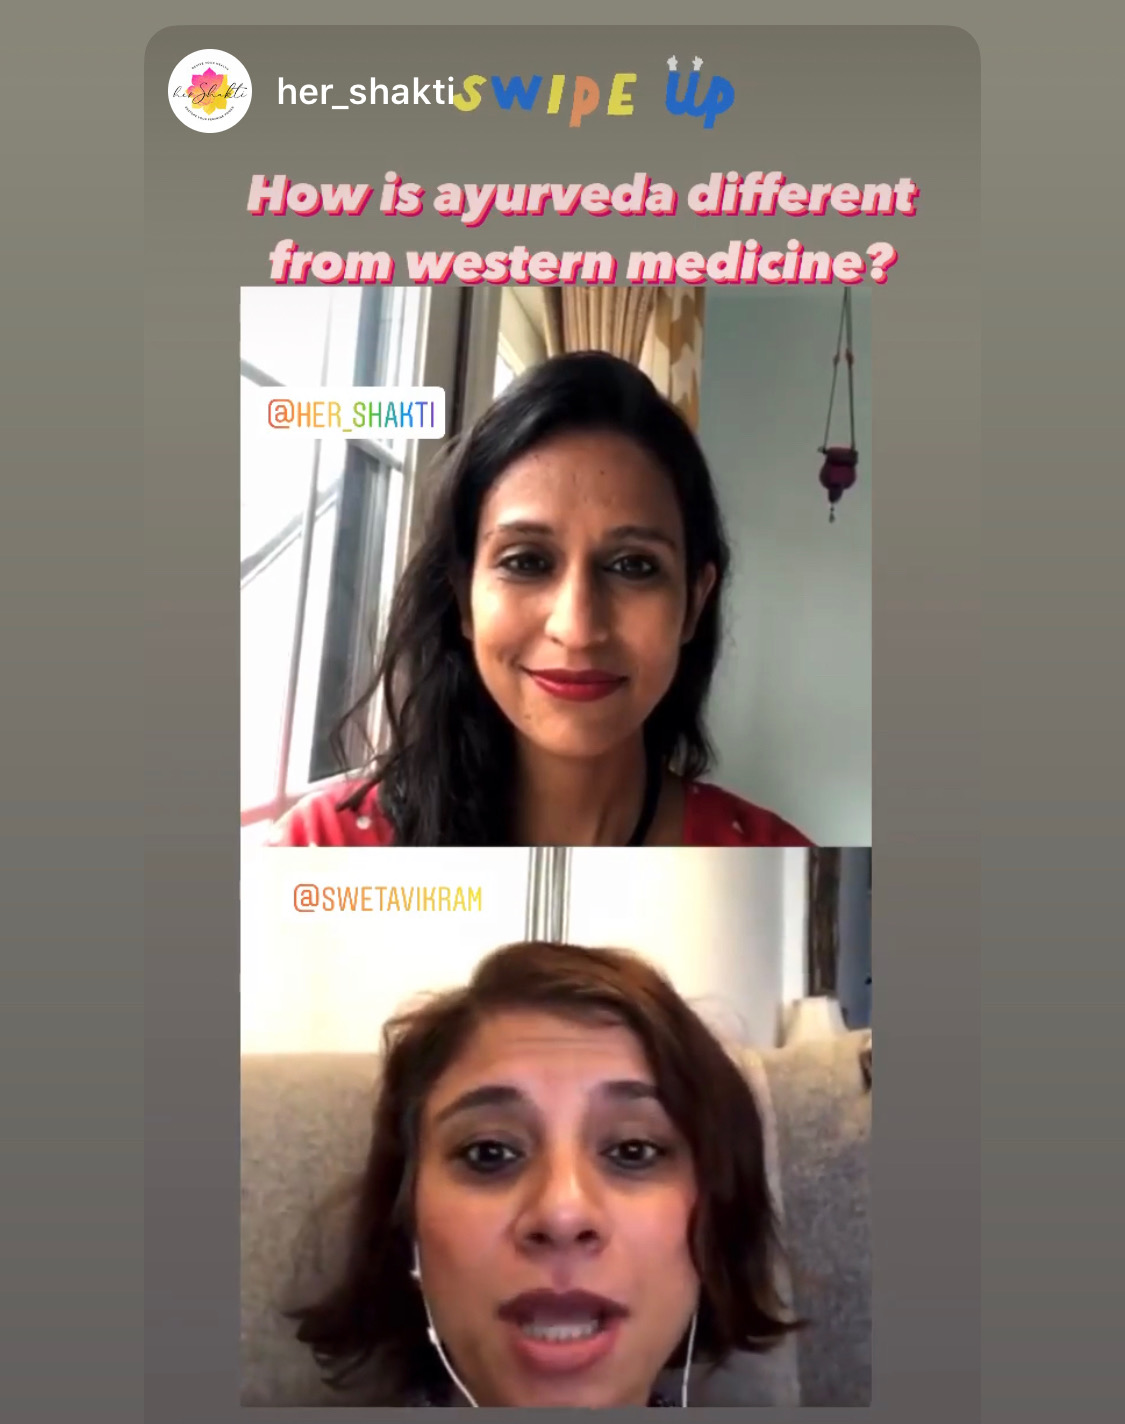 Sweta shares 5 Ayurvedic self care tips with Her Shakti.